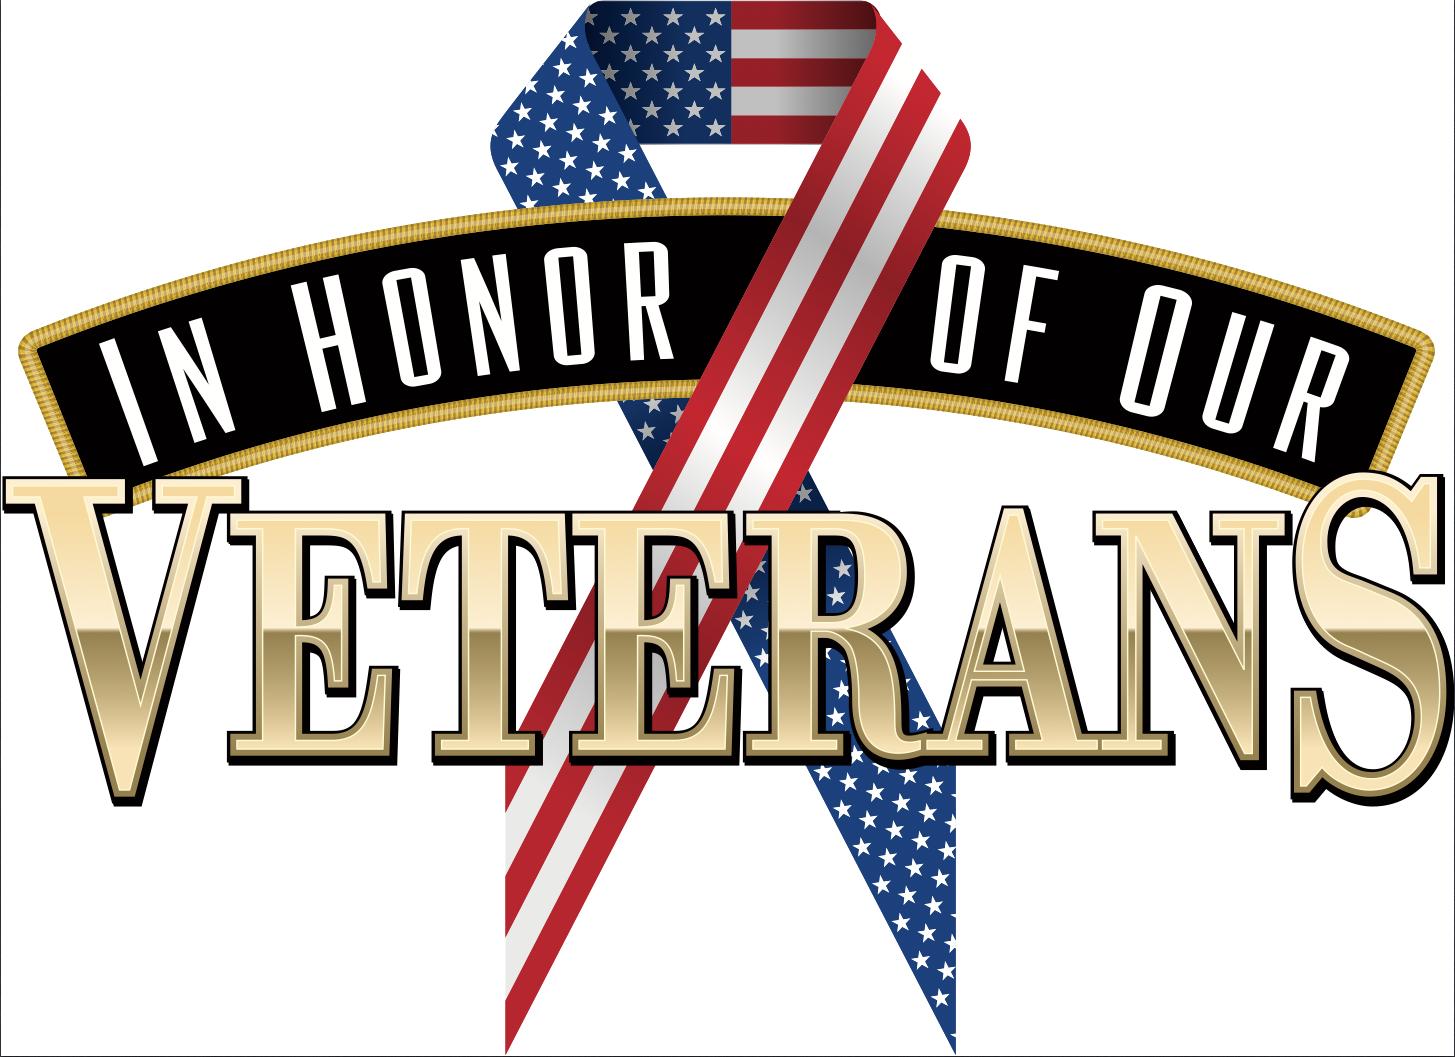 veteran-clipart-veterans-day-clip-art-veterans-day-clip-art-579463.png